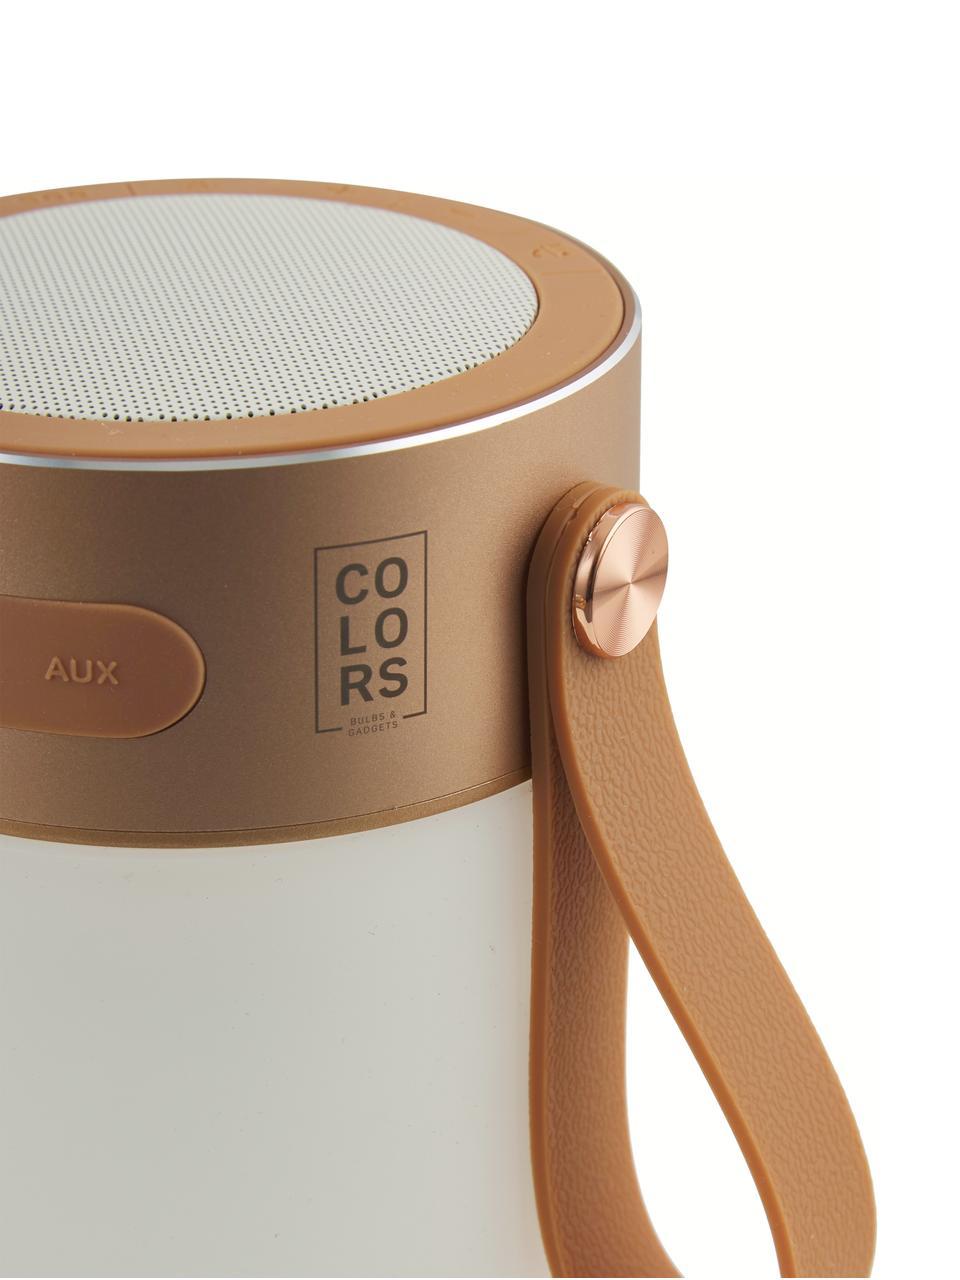 Lampada a LED da esterno portatile Sound Jar, Quadrante: metallo, Paralume: materiale sintetico, Color rame, bianco, Ø 9 x Alt. 14 cm